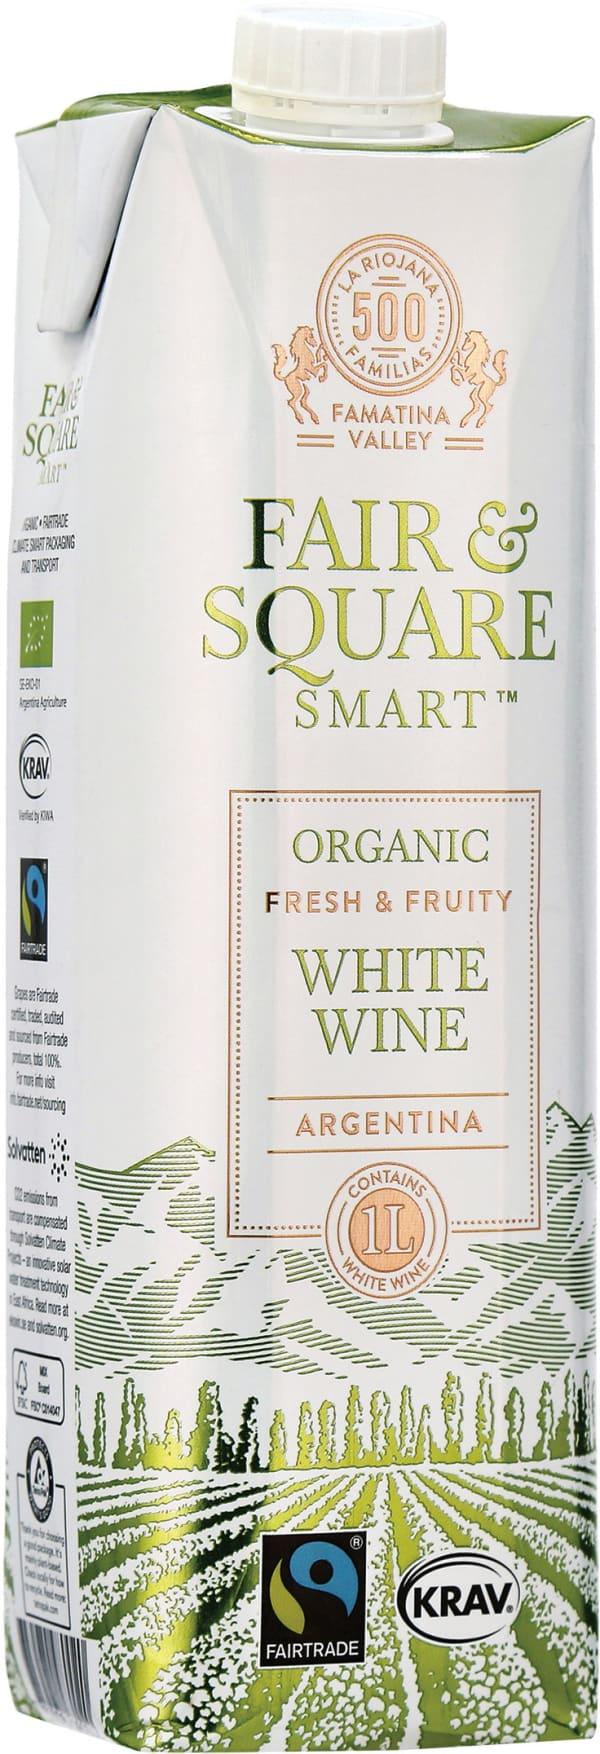 Fair & Square White 2019 kartongförpackning